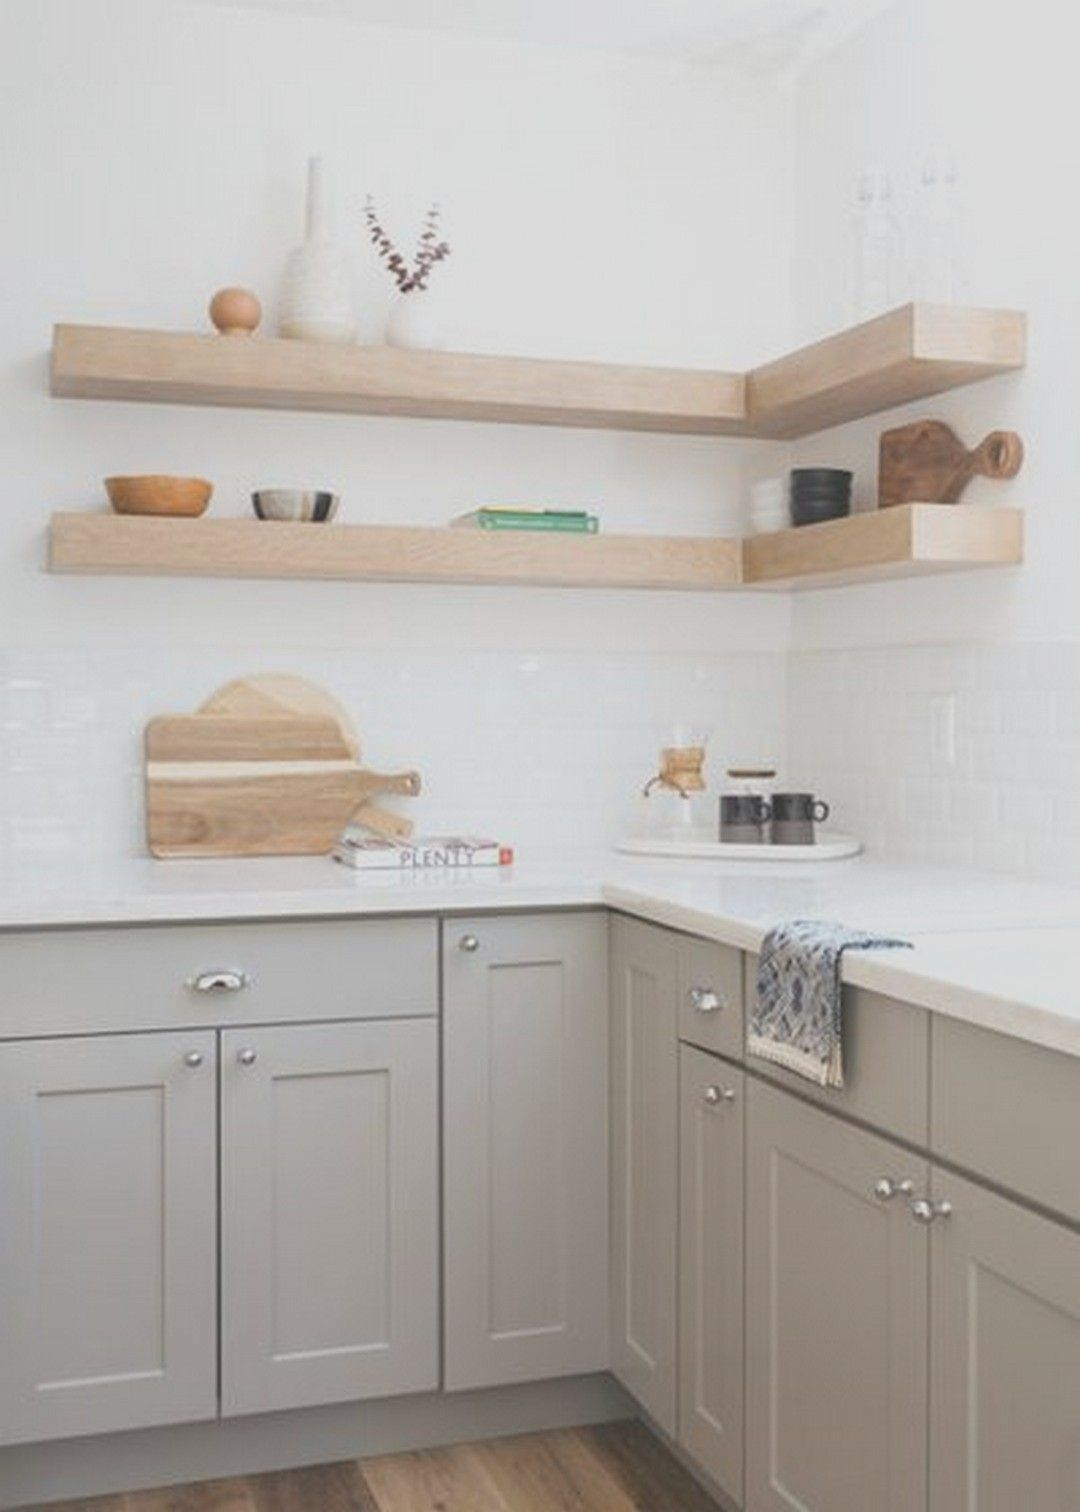 47 Amazing Kitchen Island Ideas You Will Love Kitchen Renovation New Kitchen Cabinets New Kitchen